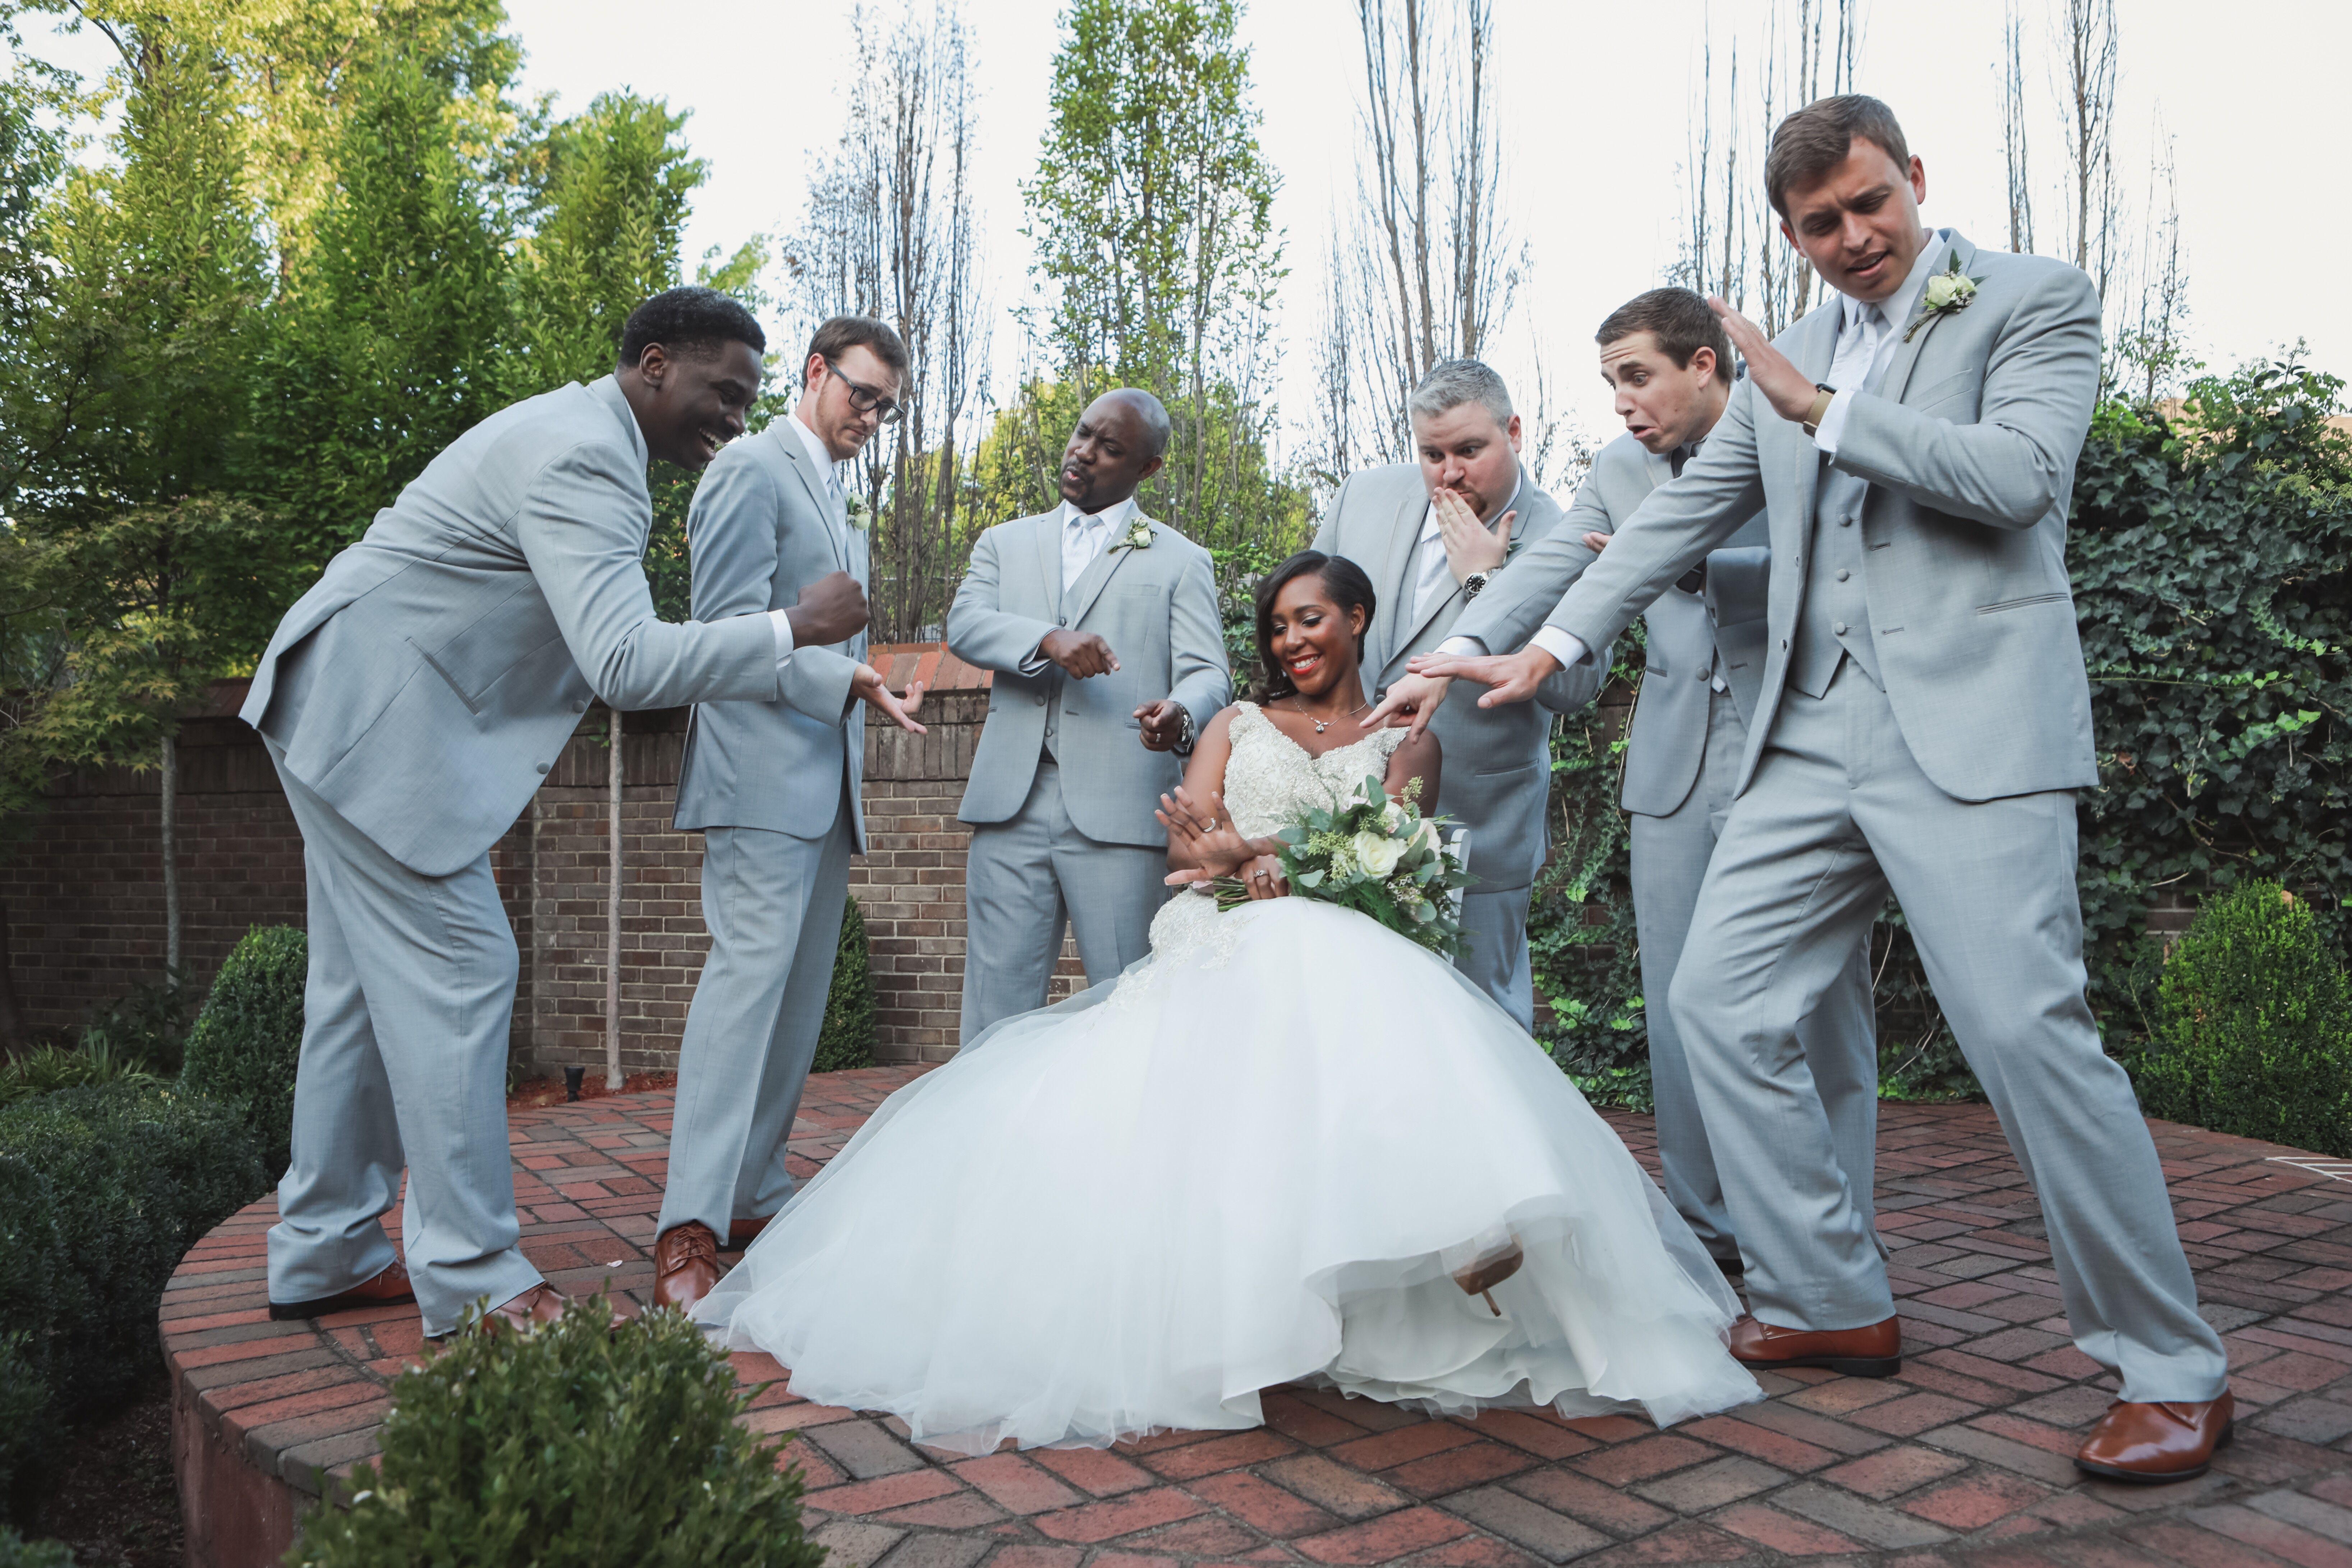 wedding planners knoxville tn - Wedding Decor Ideas